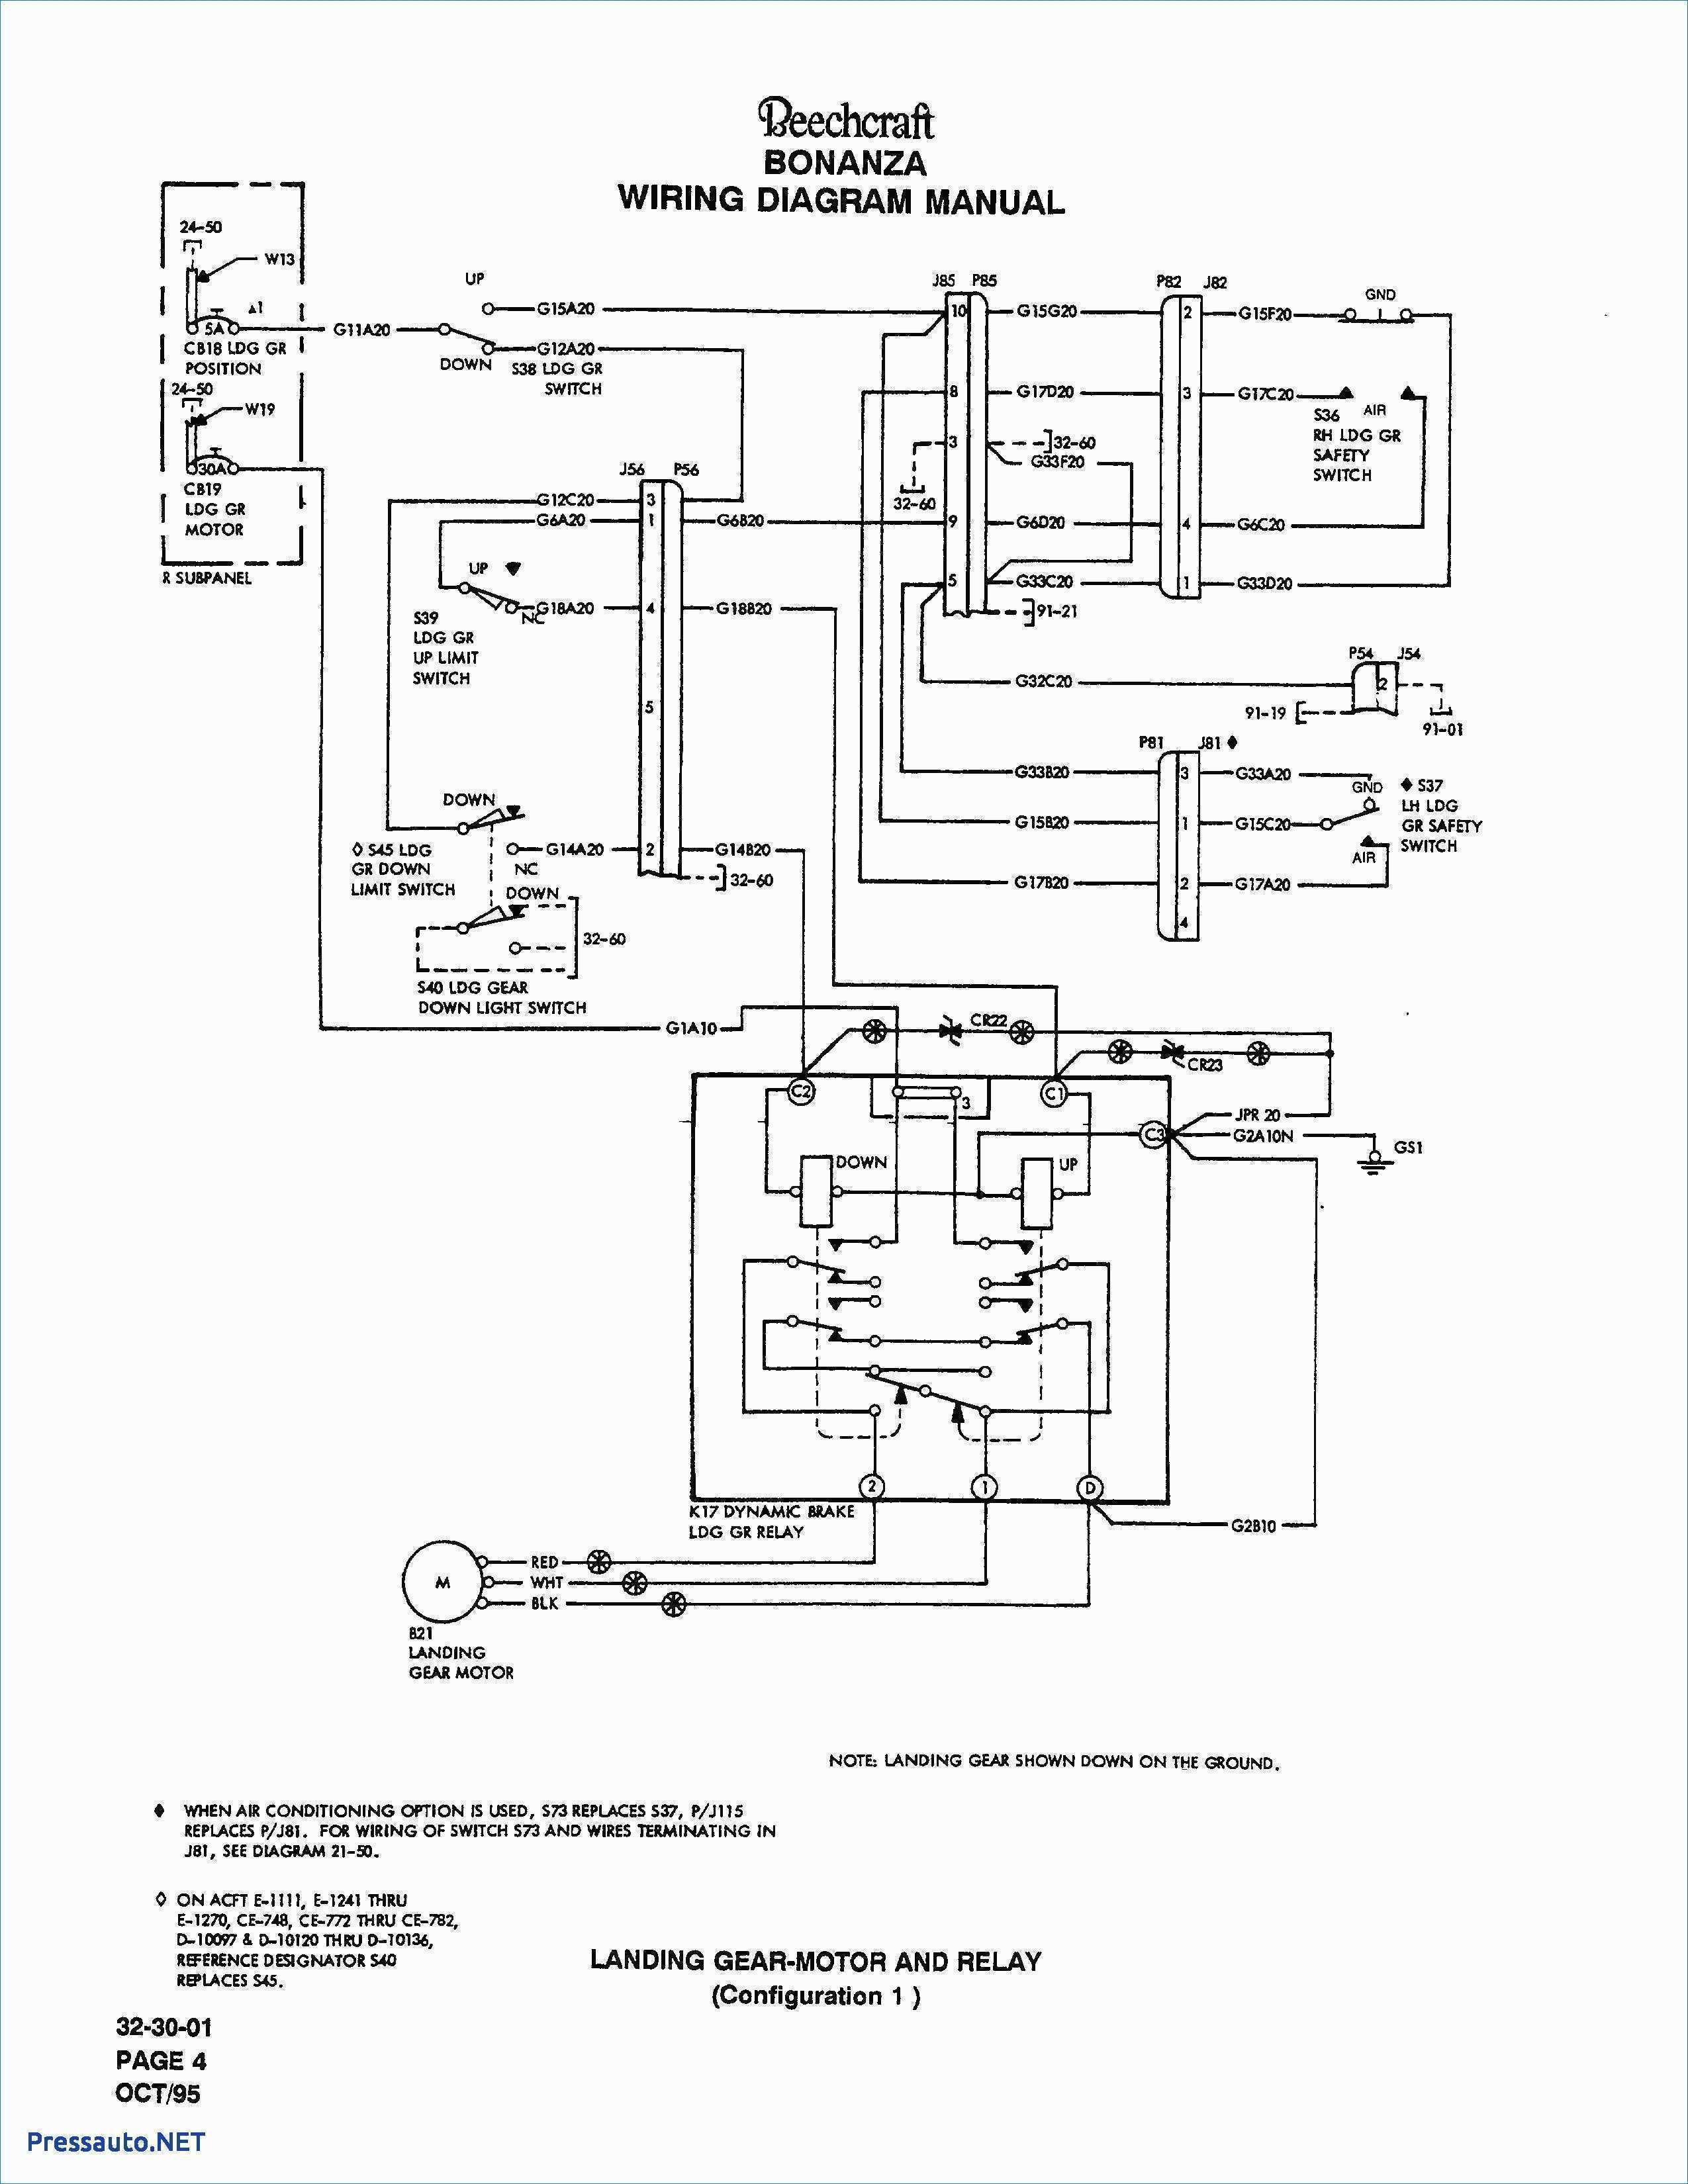 4 Port Fisher Wiring Diagram | Wiring Diagram - Fisher 4 Port Isolation Module Wiring Diagram